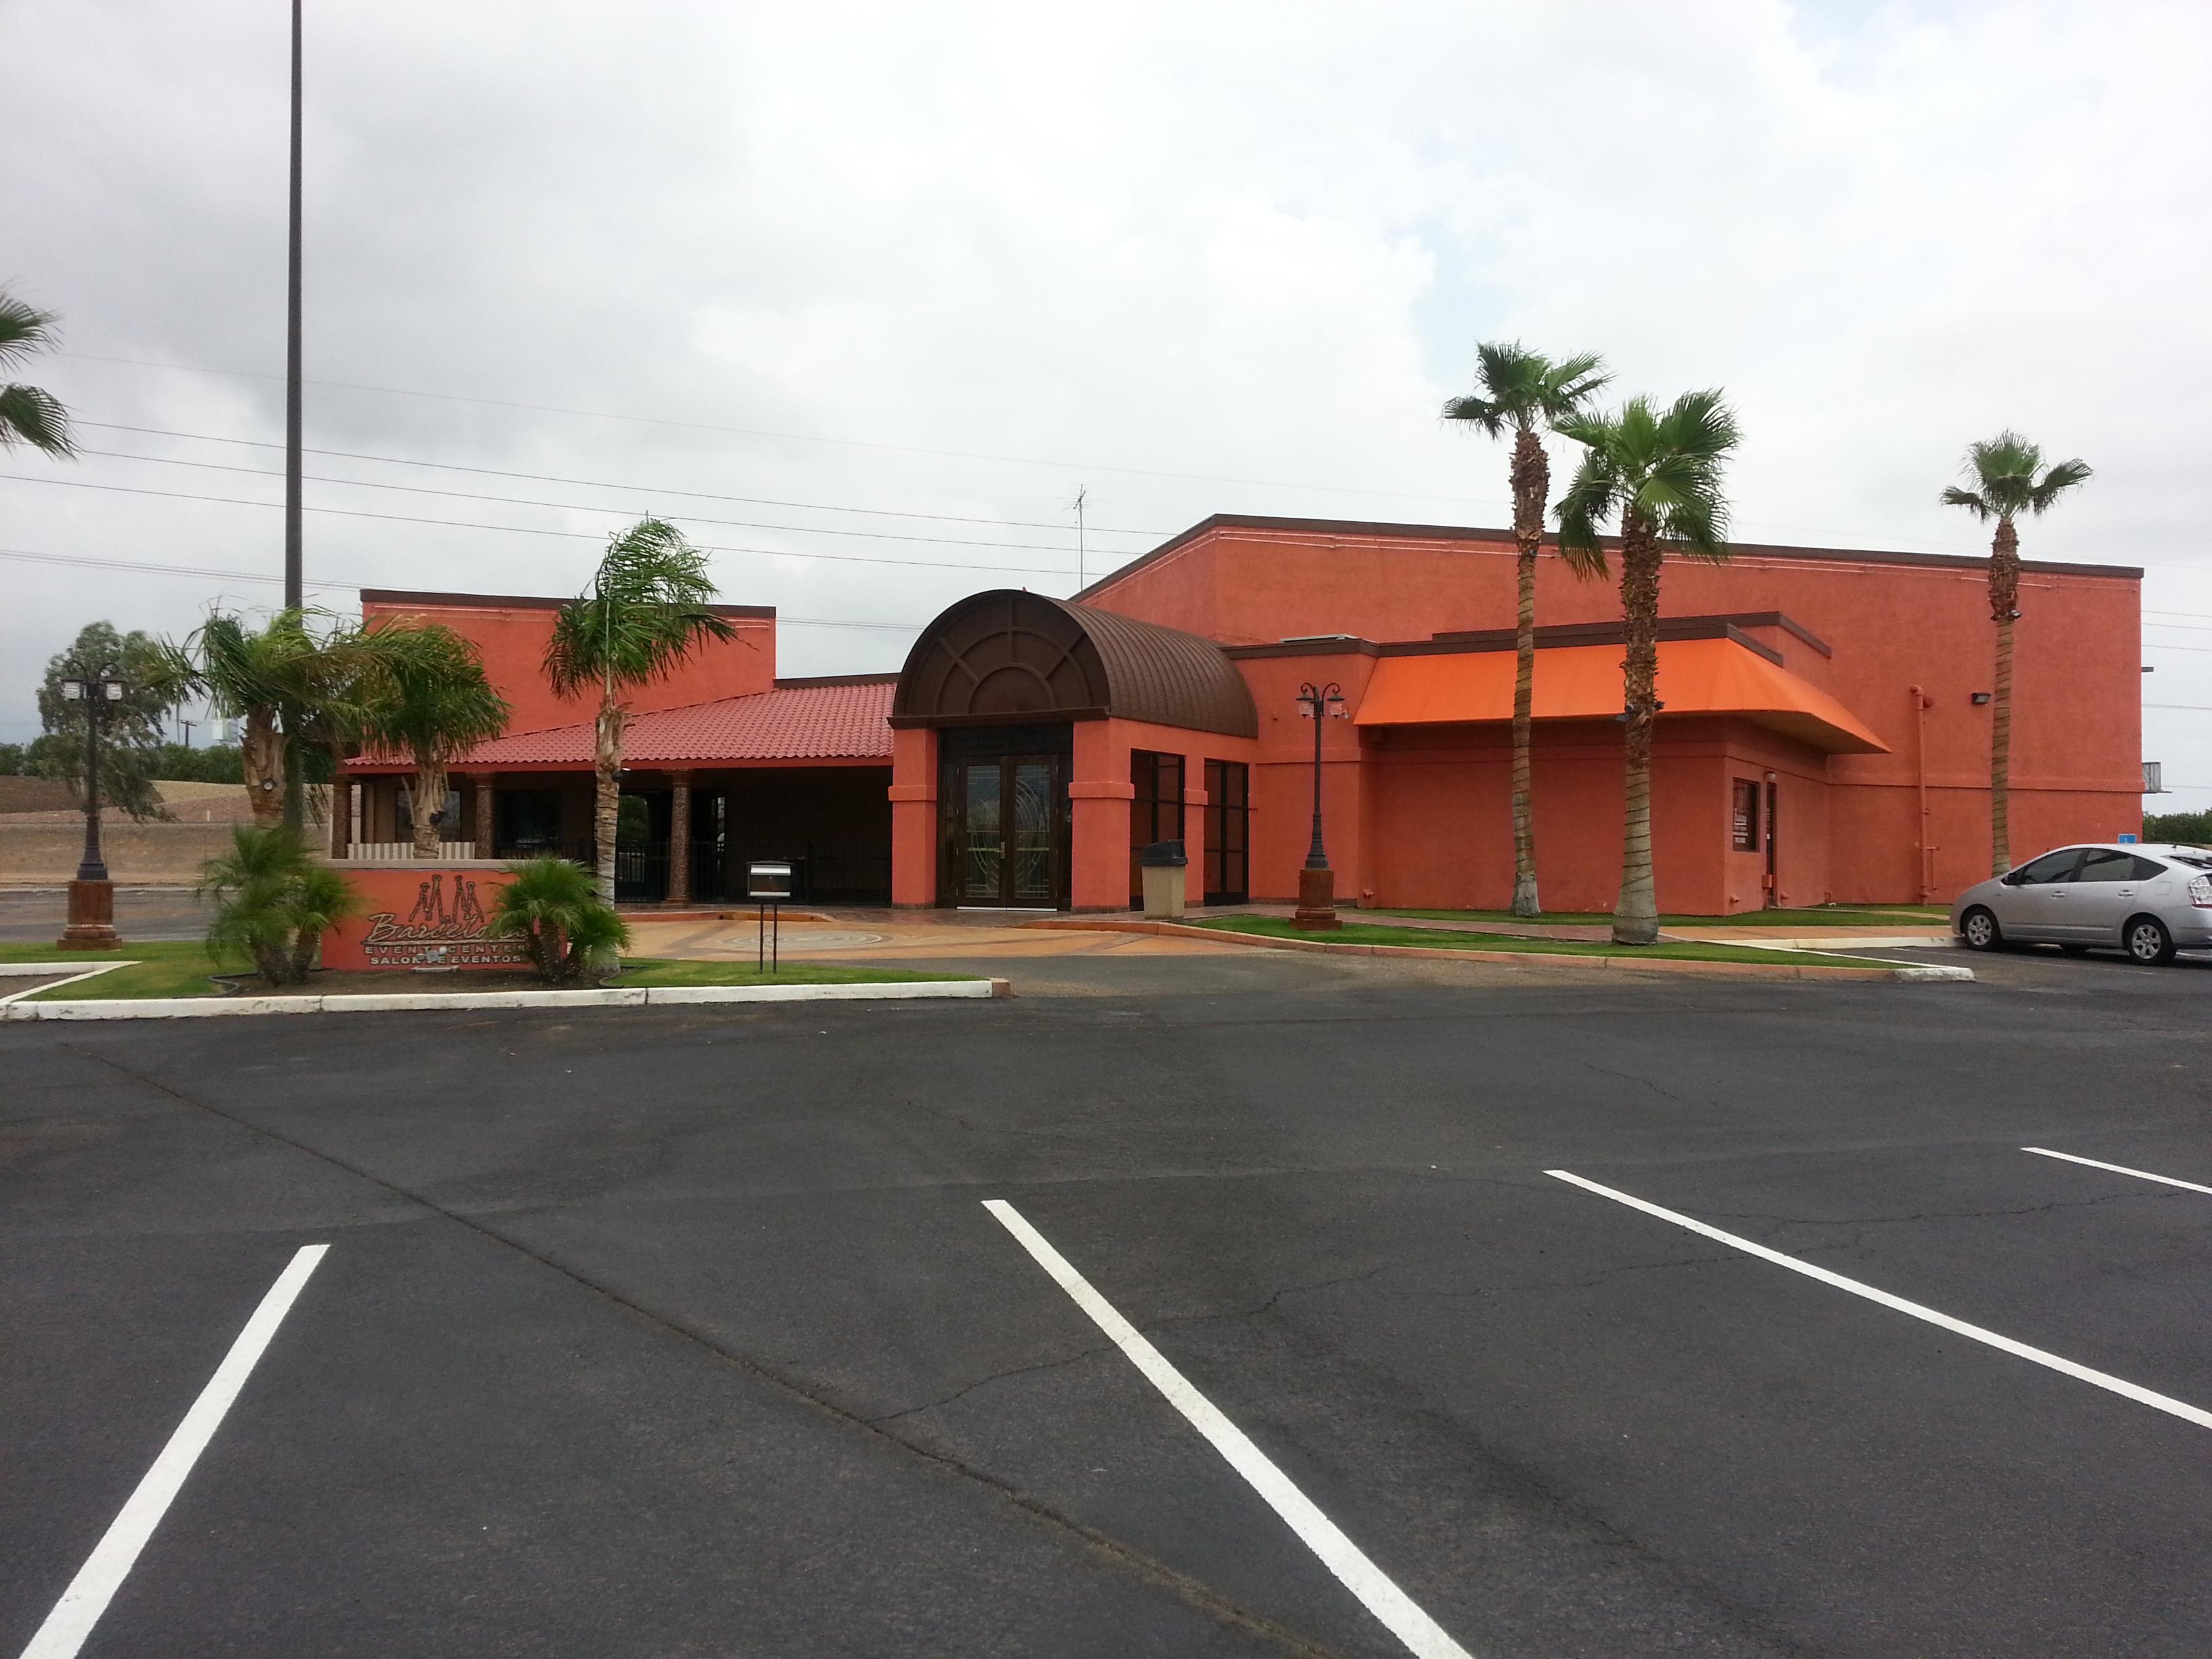 BARCELONA EVENT CENTER, El Centro CA